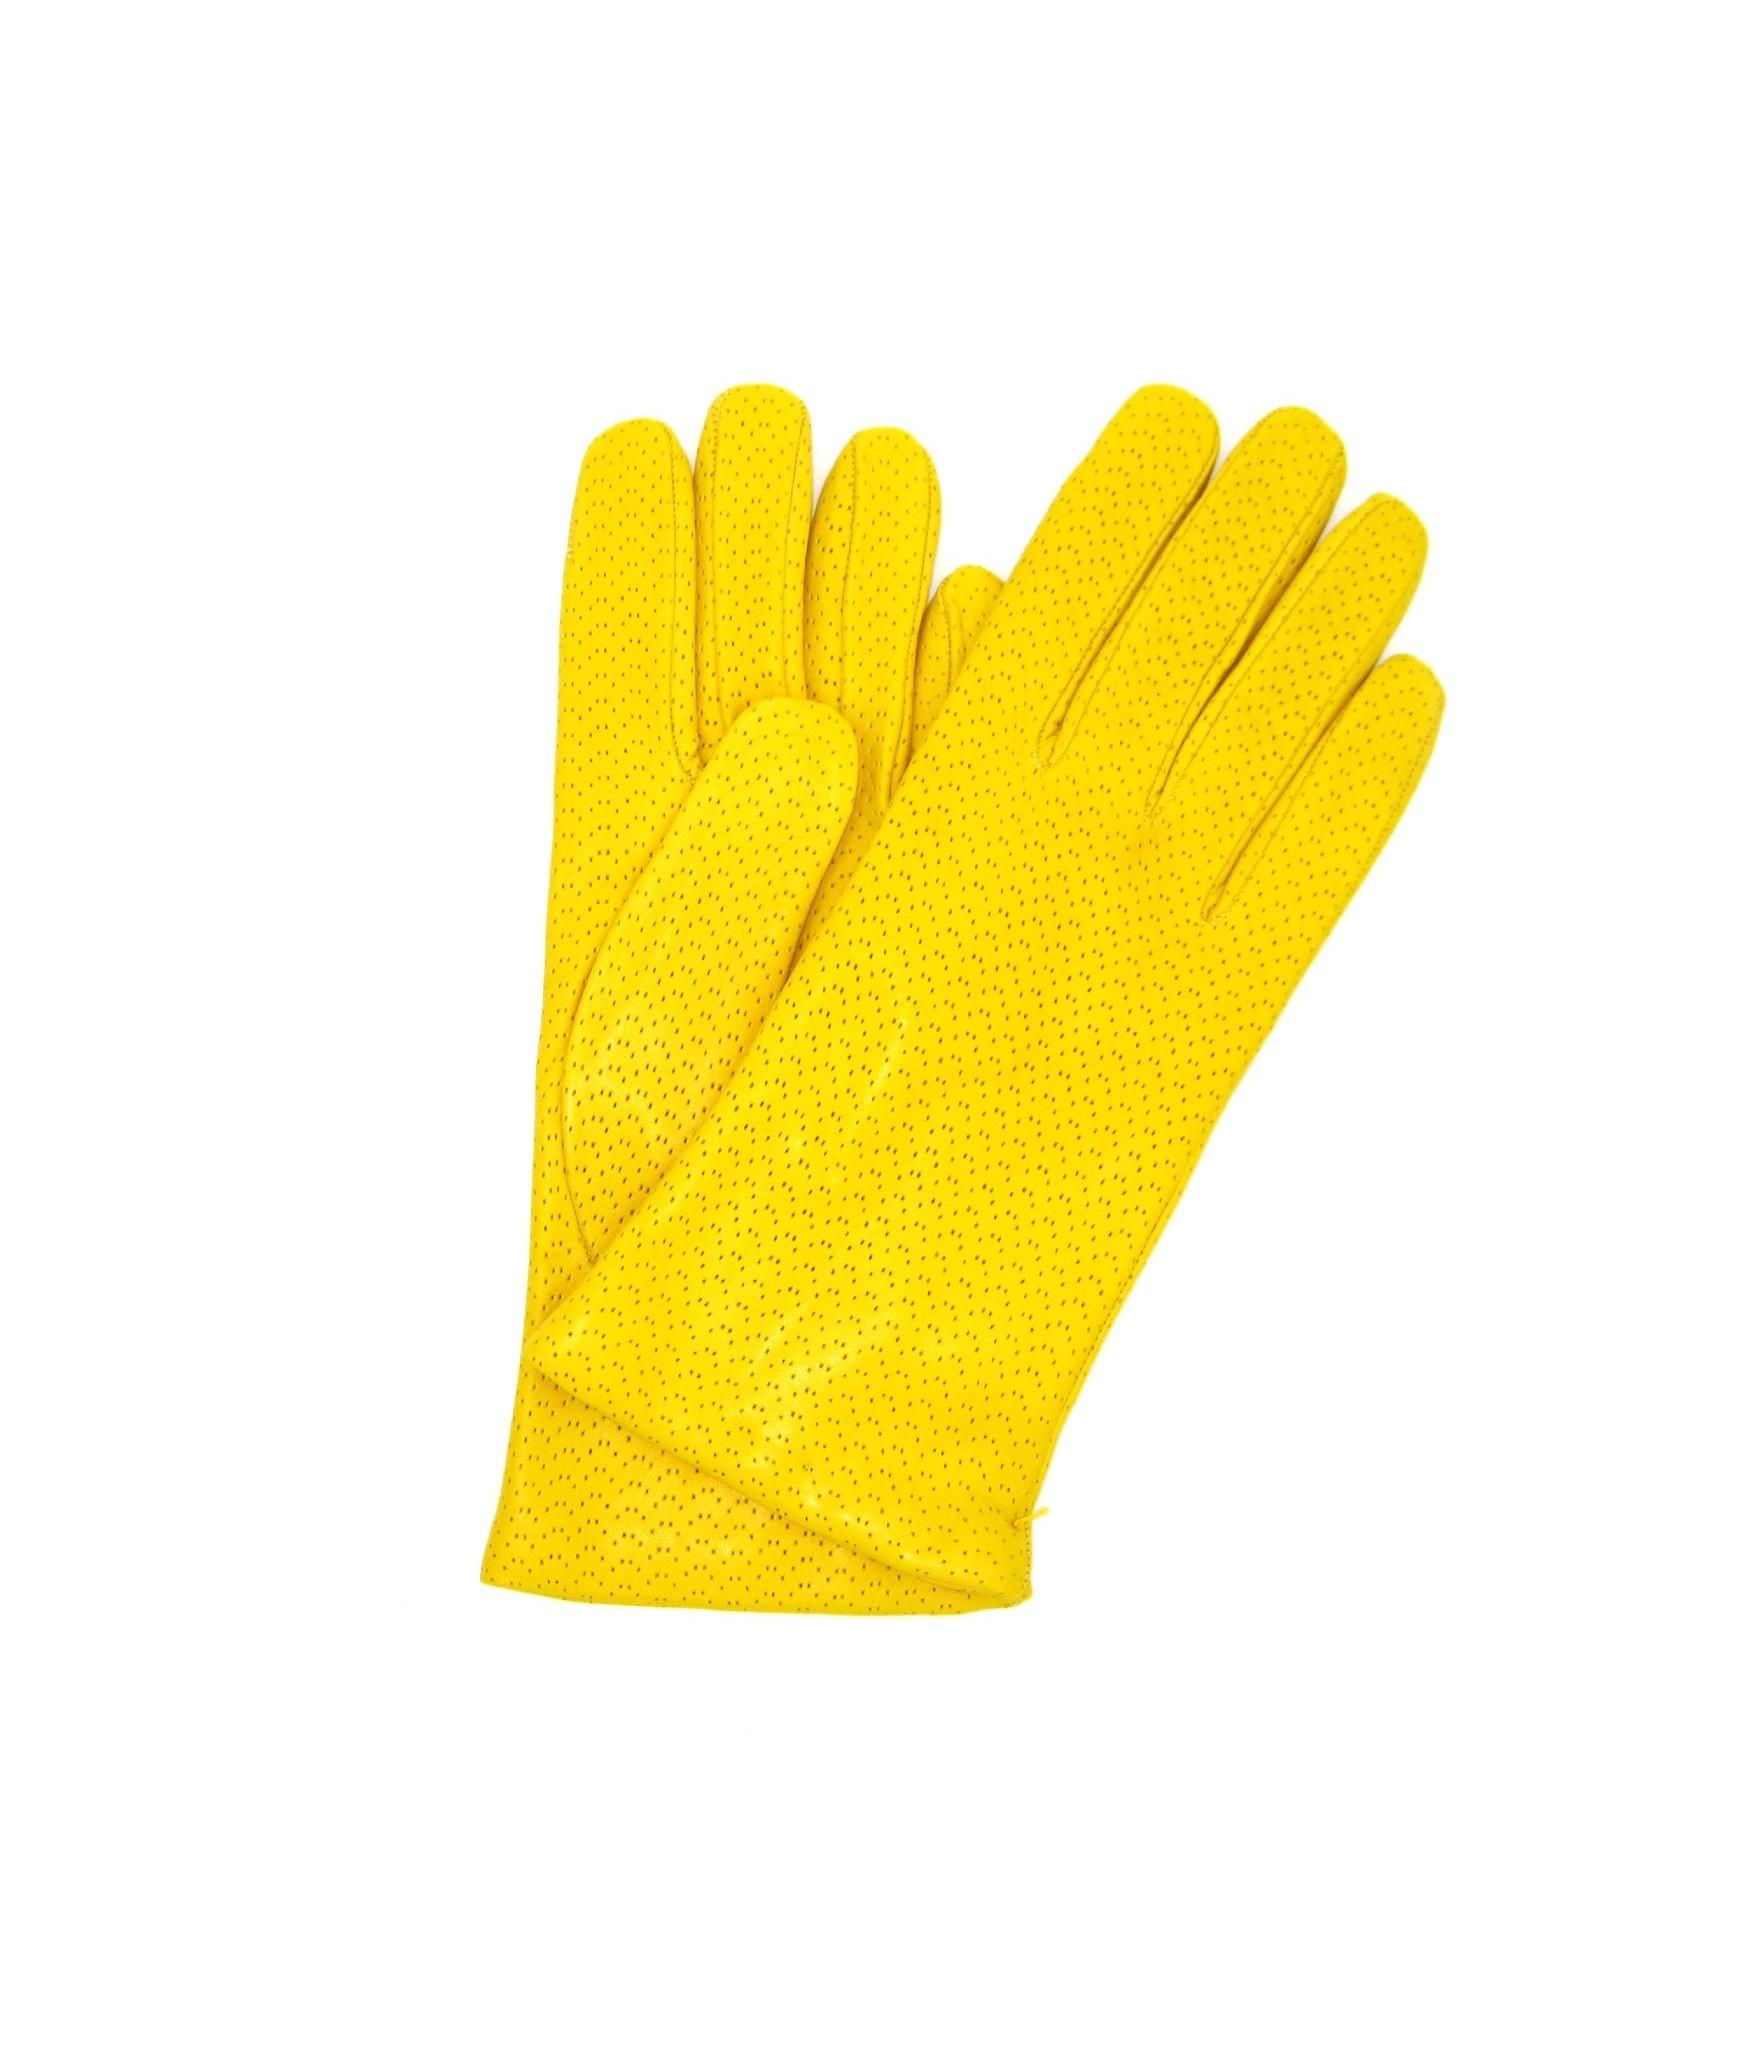 Guanto Nappa 2bt foderato cashmere Giallo Sermoneta Gloves